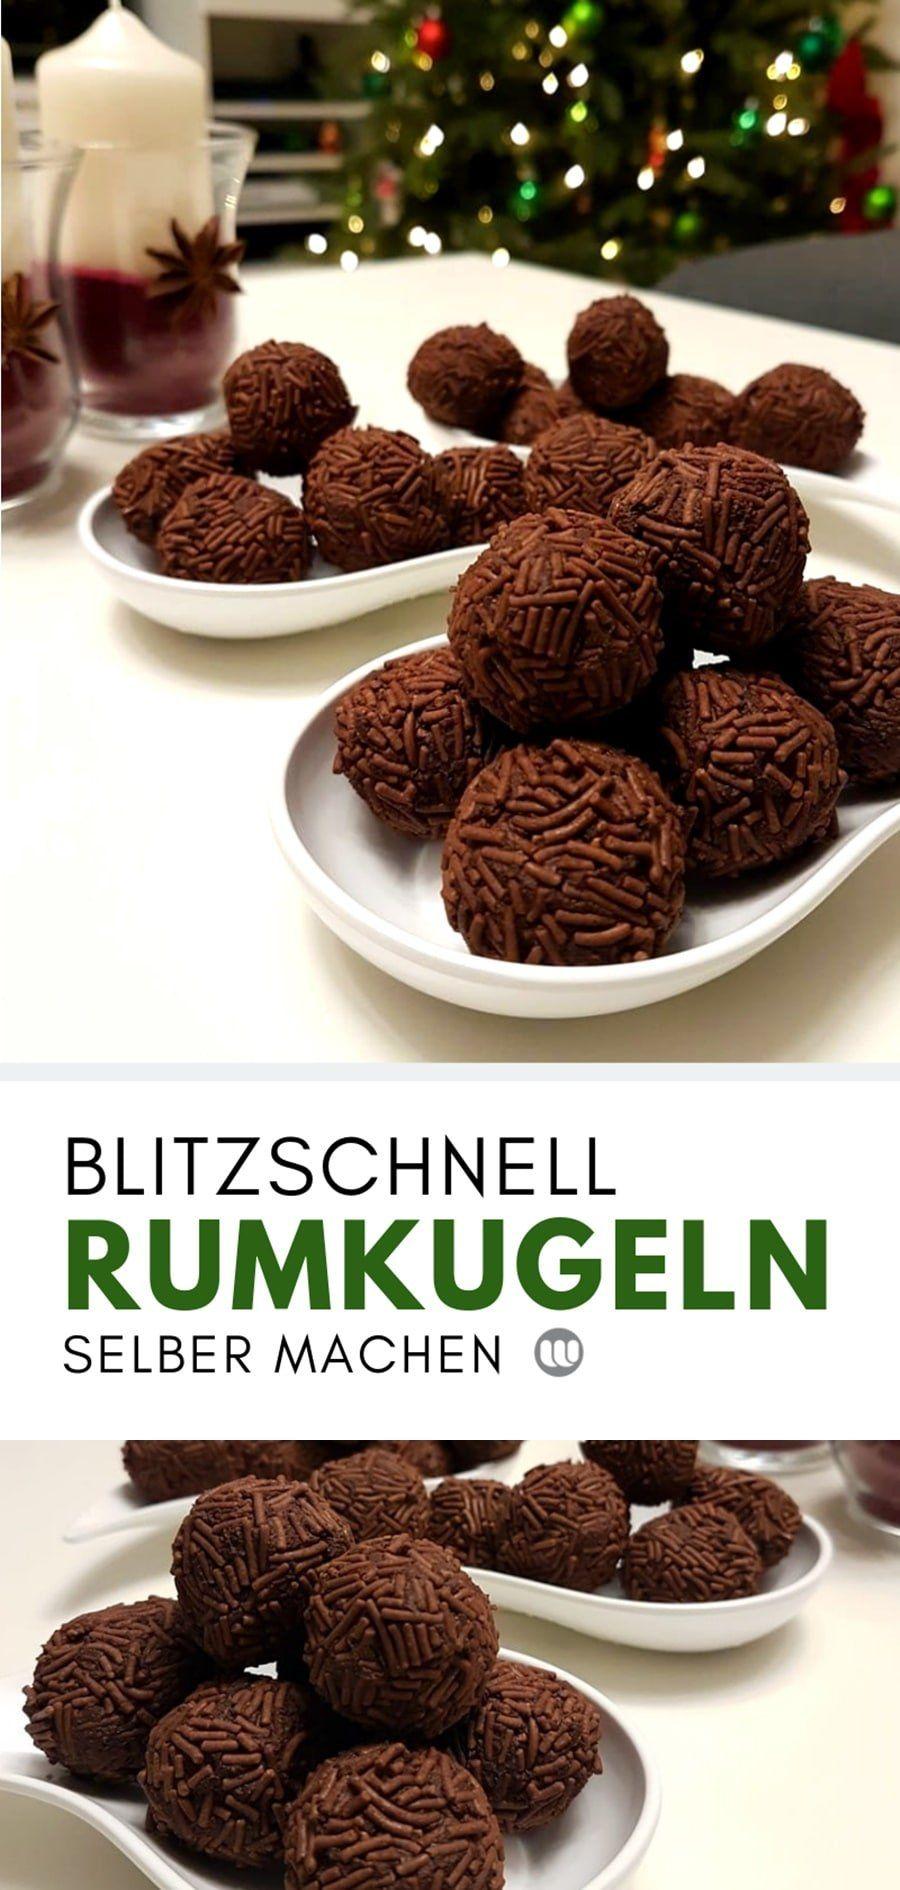 Rezept: Rumkugeln aus geriebener Schokolade selber machen – Pralinen